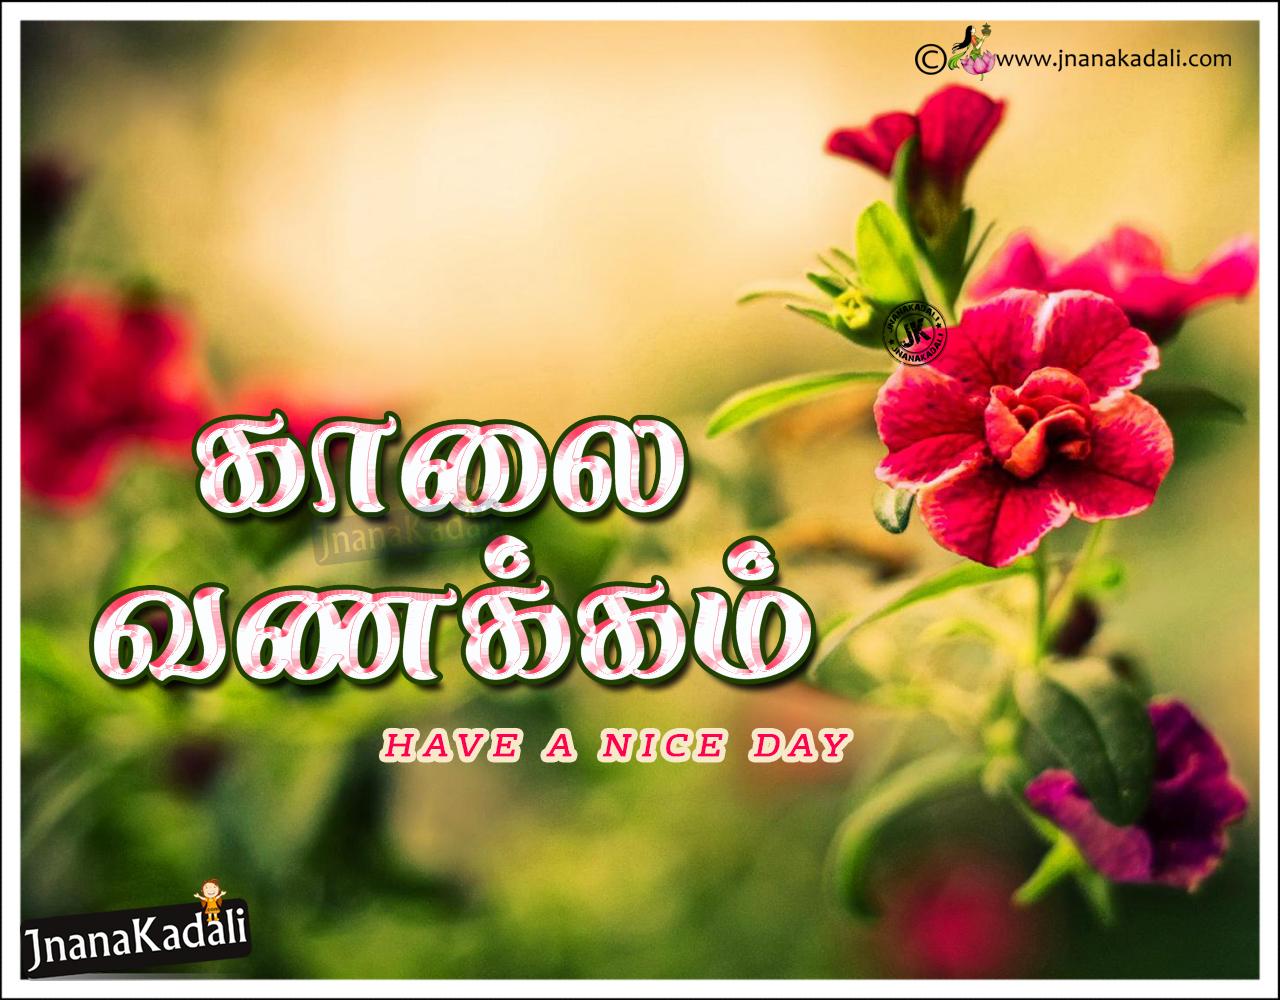 Good Morning Greetings With Hd Wallpapers In Tamil Jnana Kadali